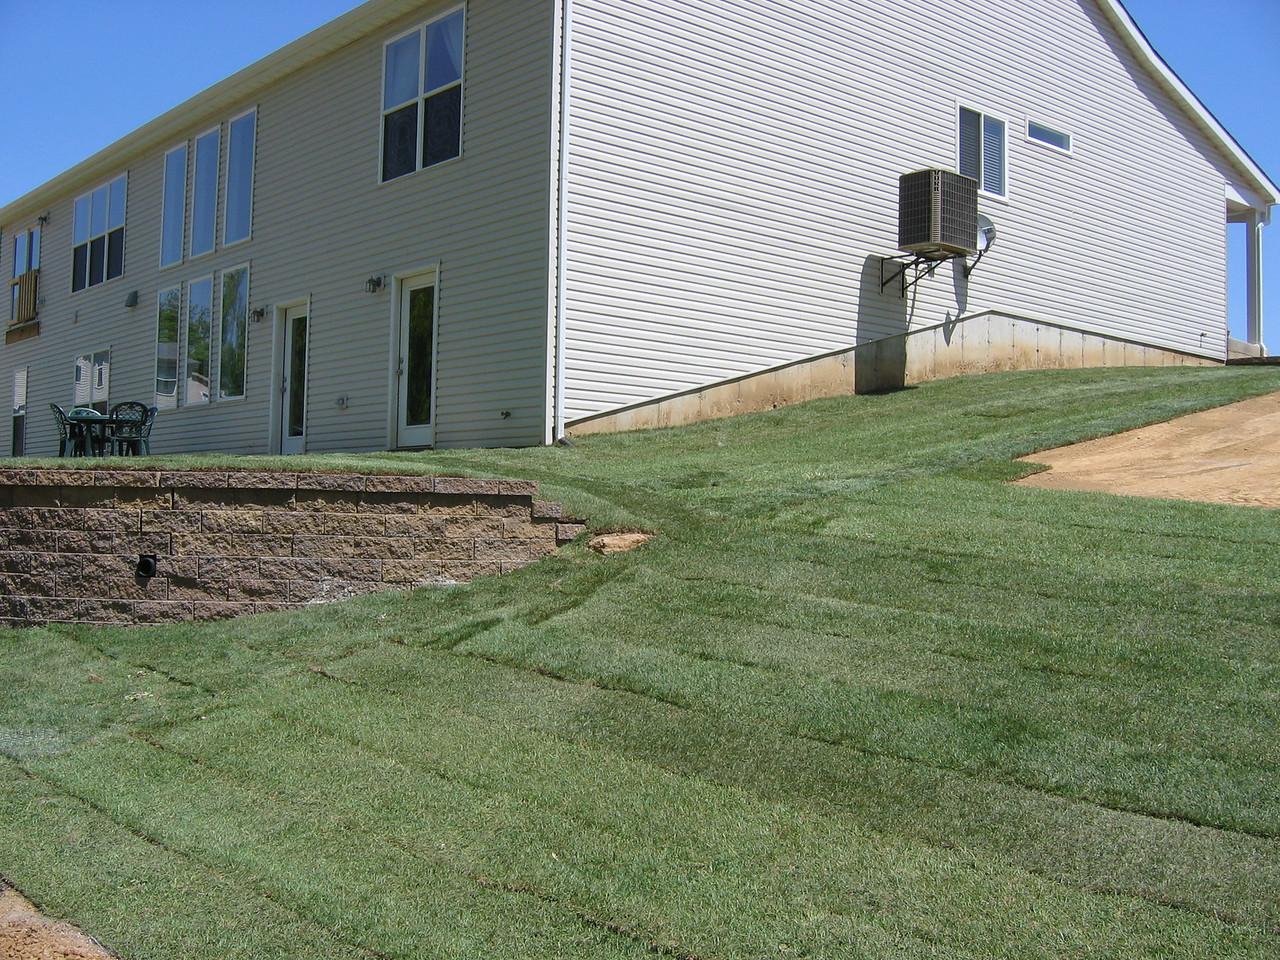 Side Yard Sodded May 4